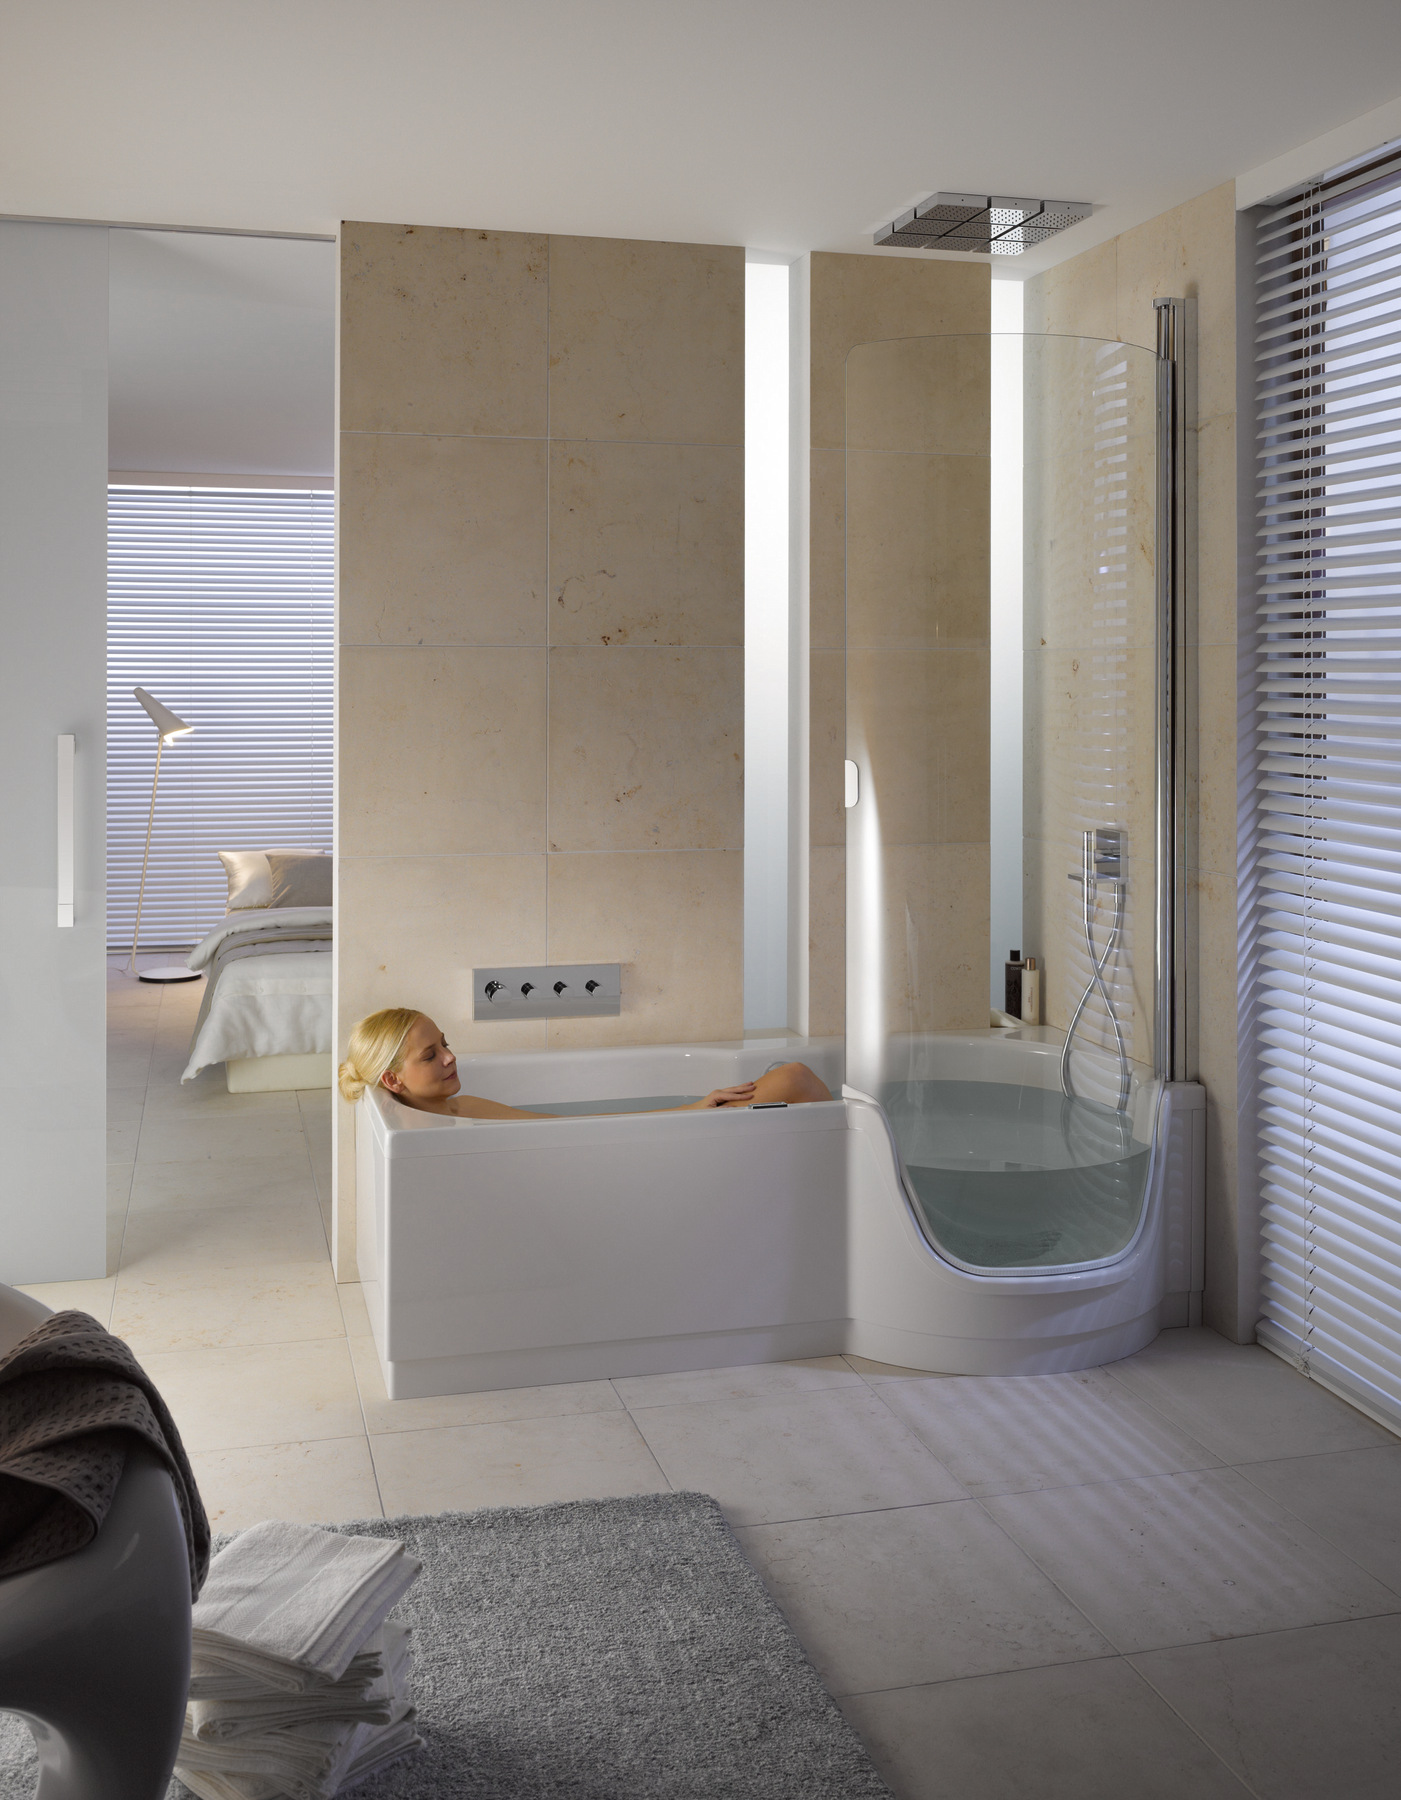 Ba era con ducha con puerta bettetwist ii by bette - Banera con ducha ...